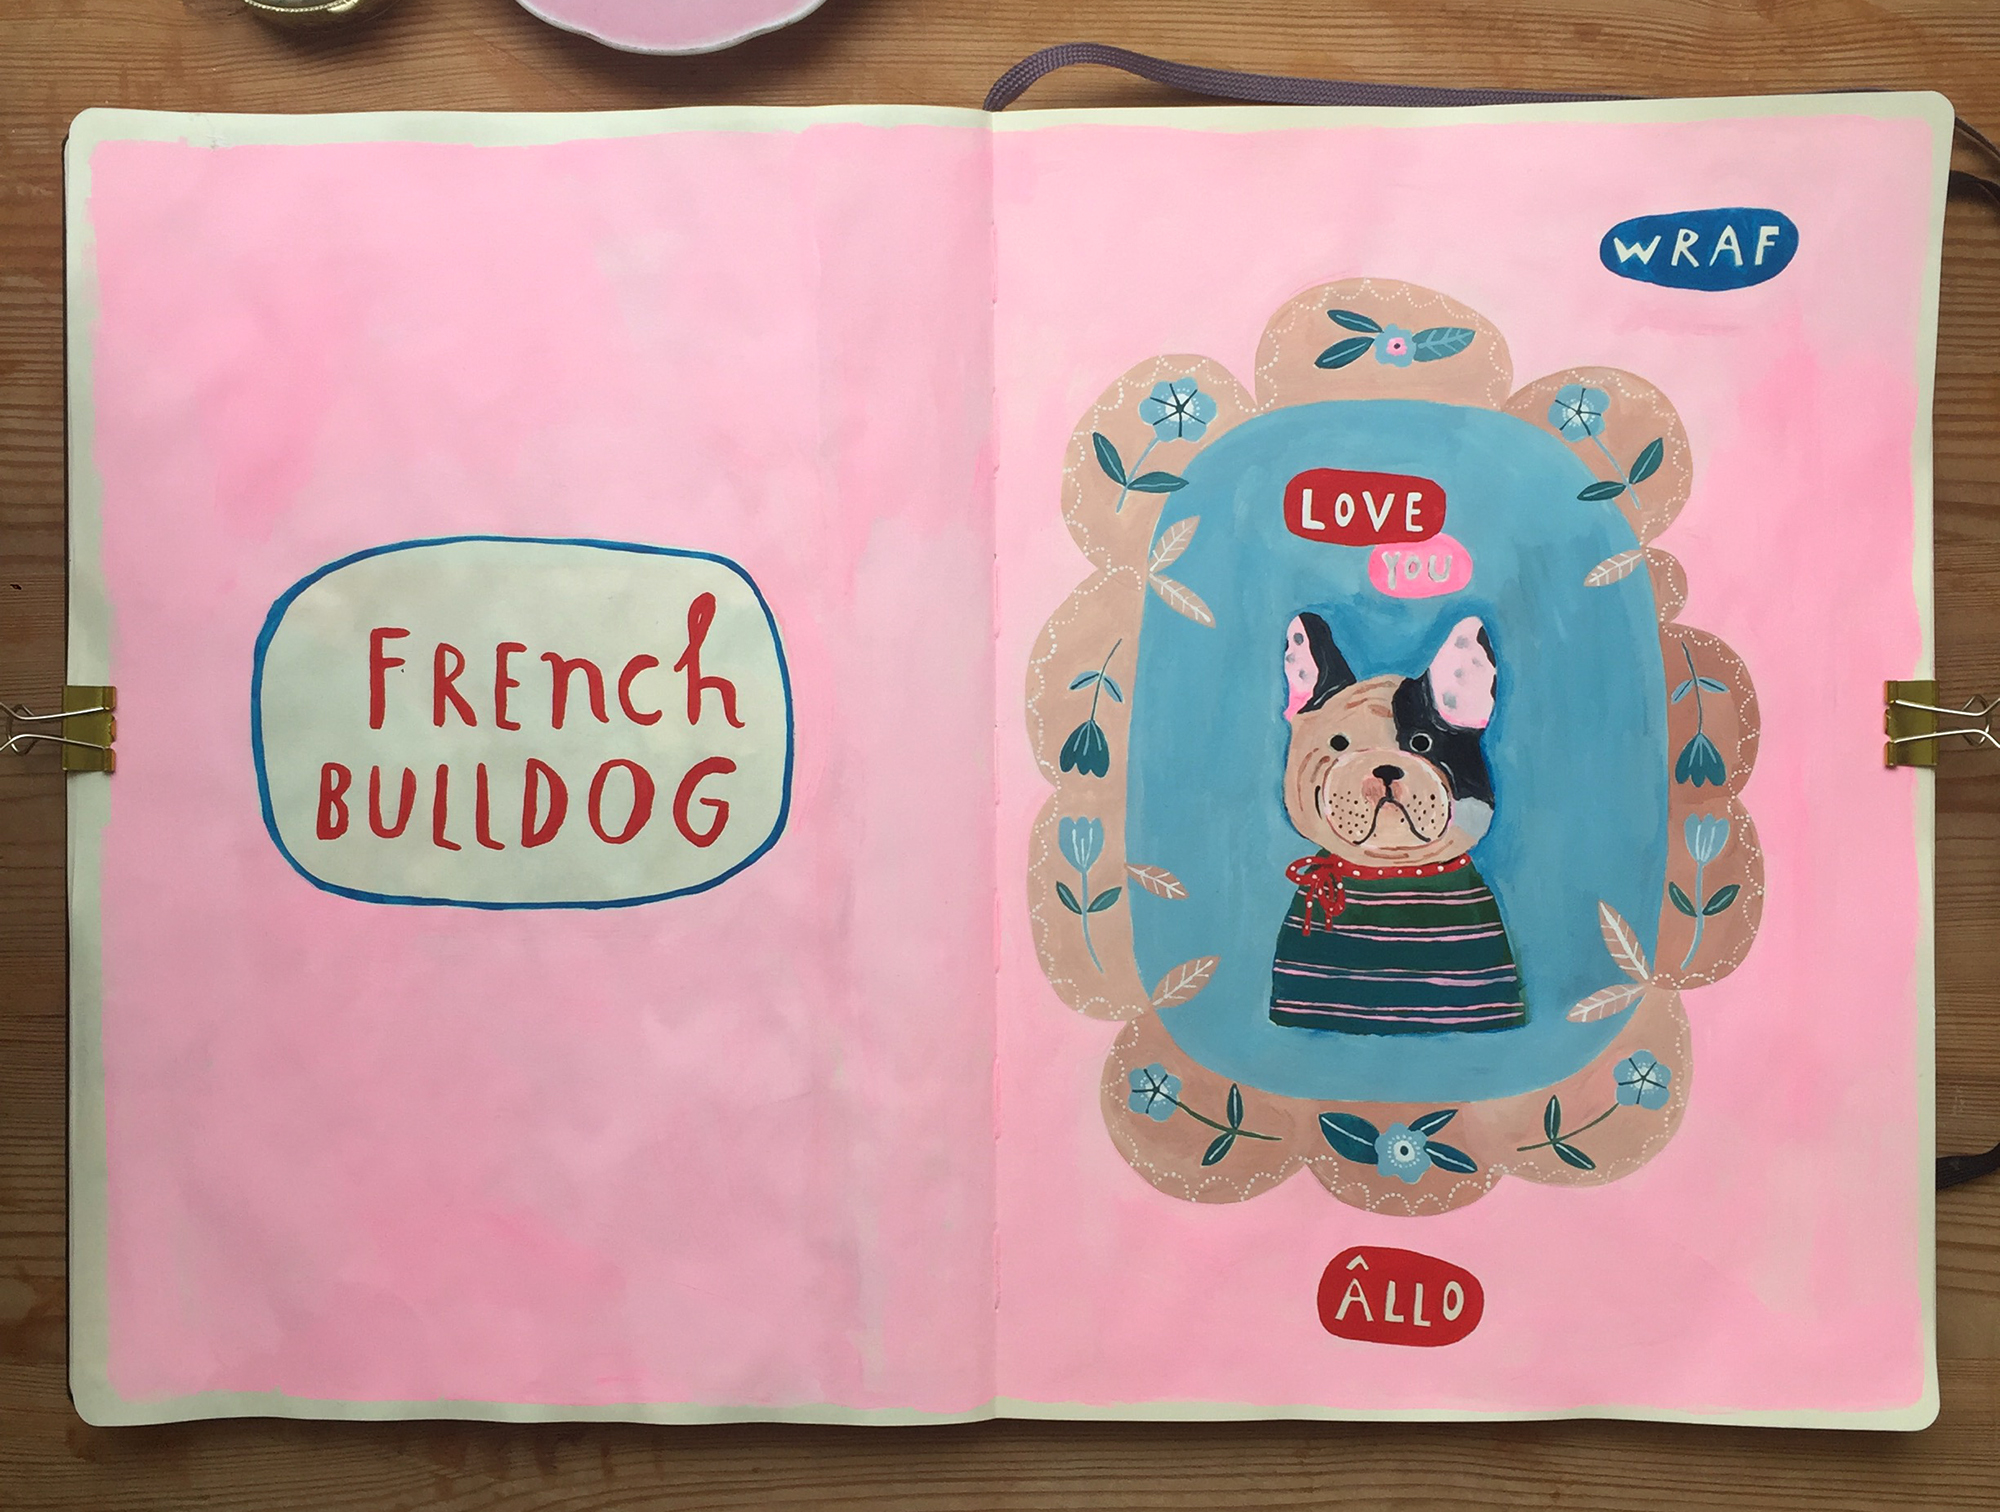 french bulldog illustration by Marenthe.jpg